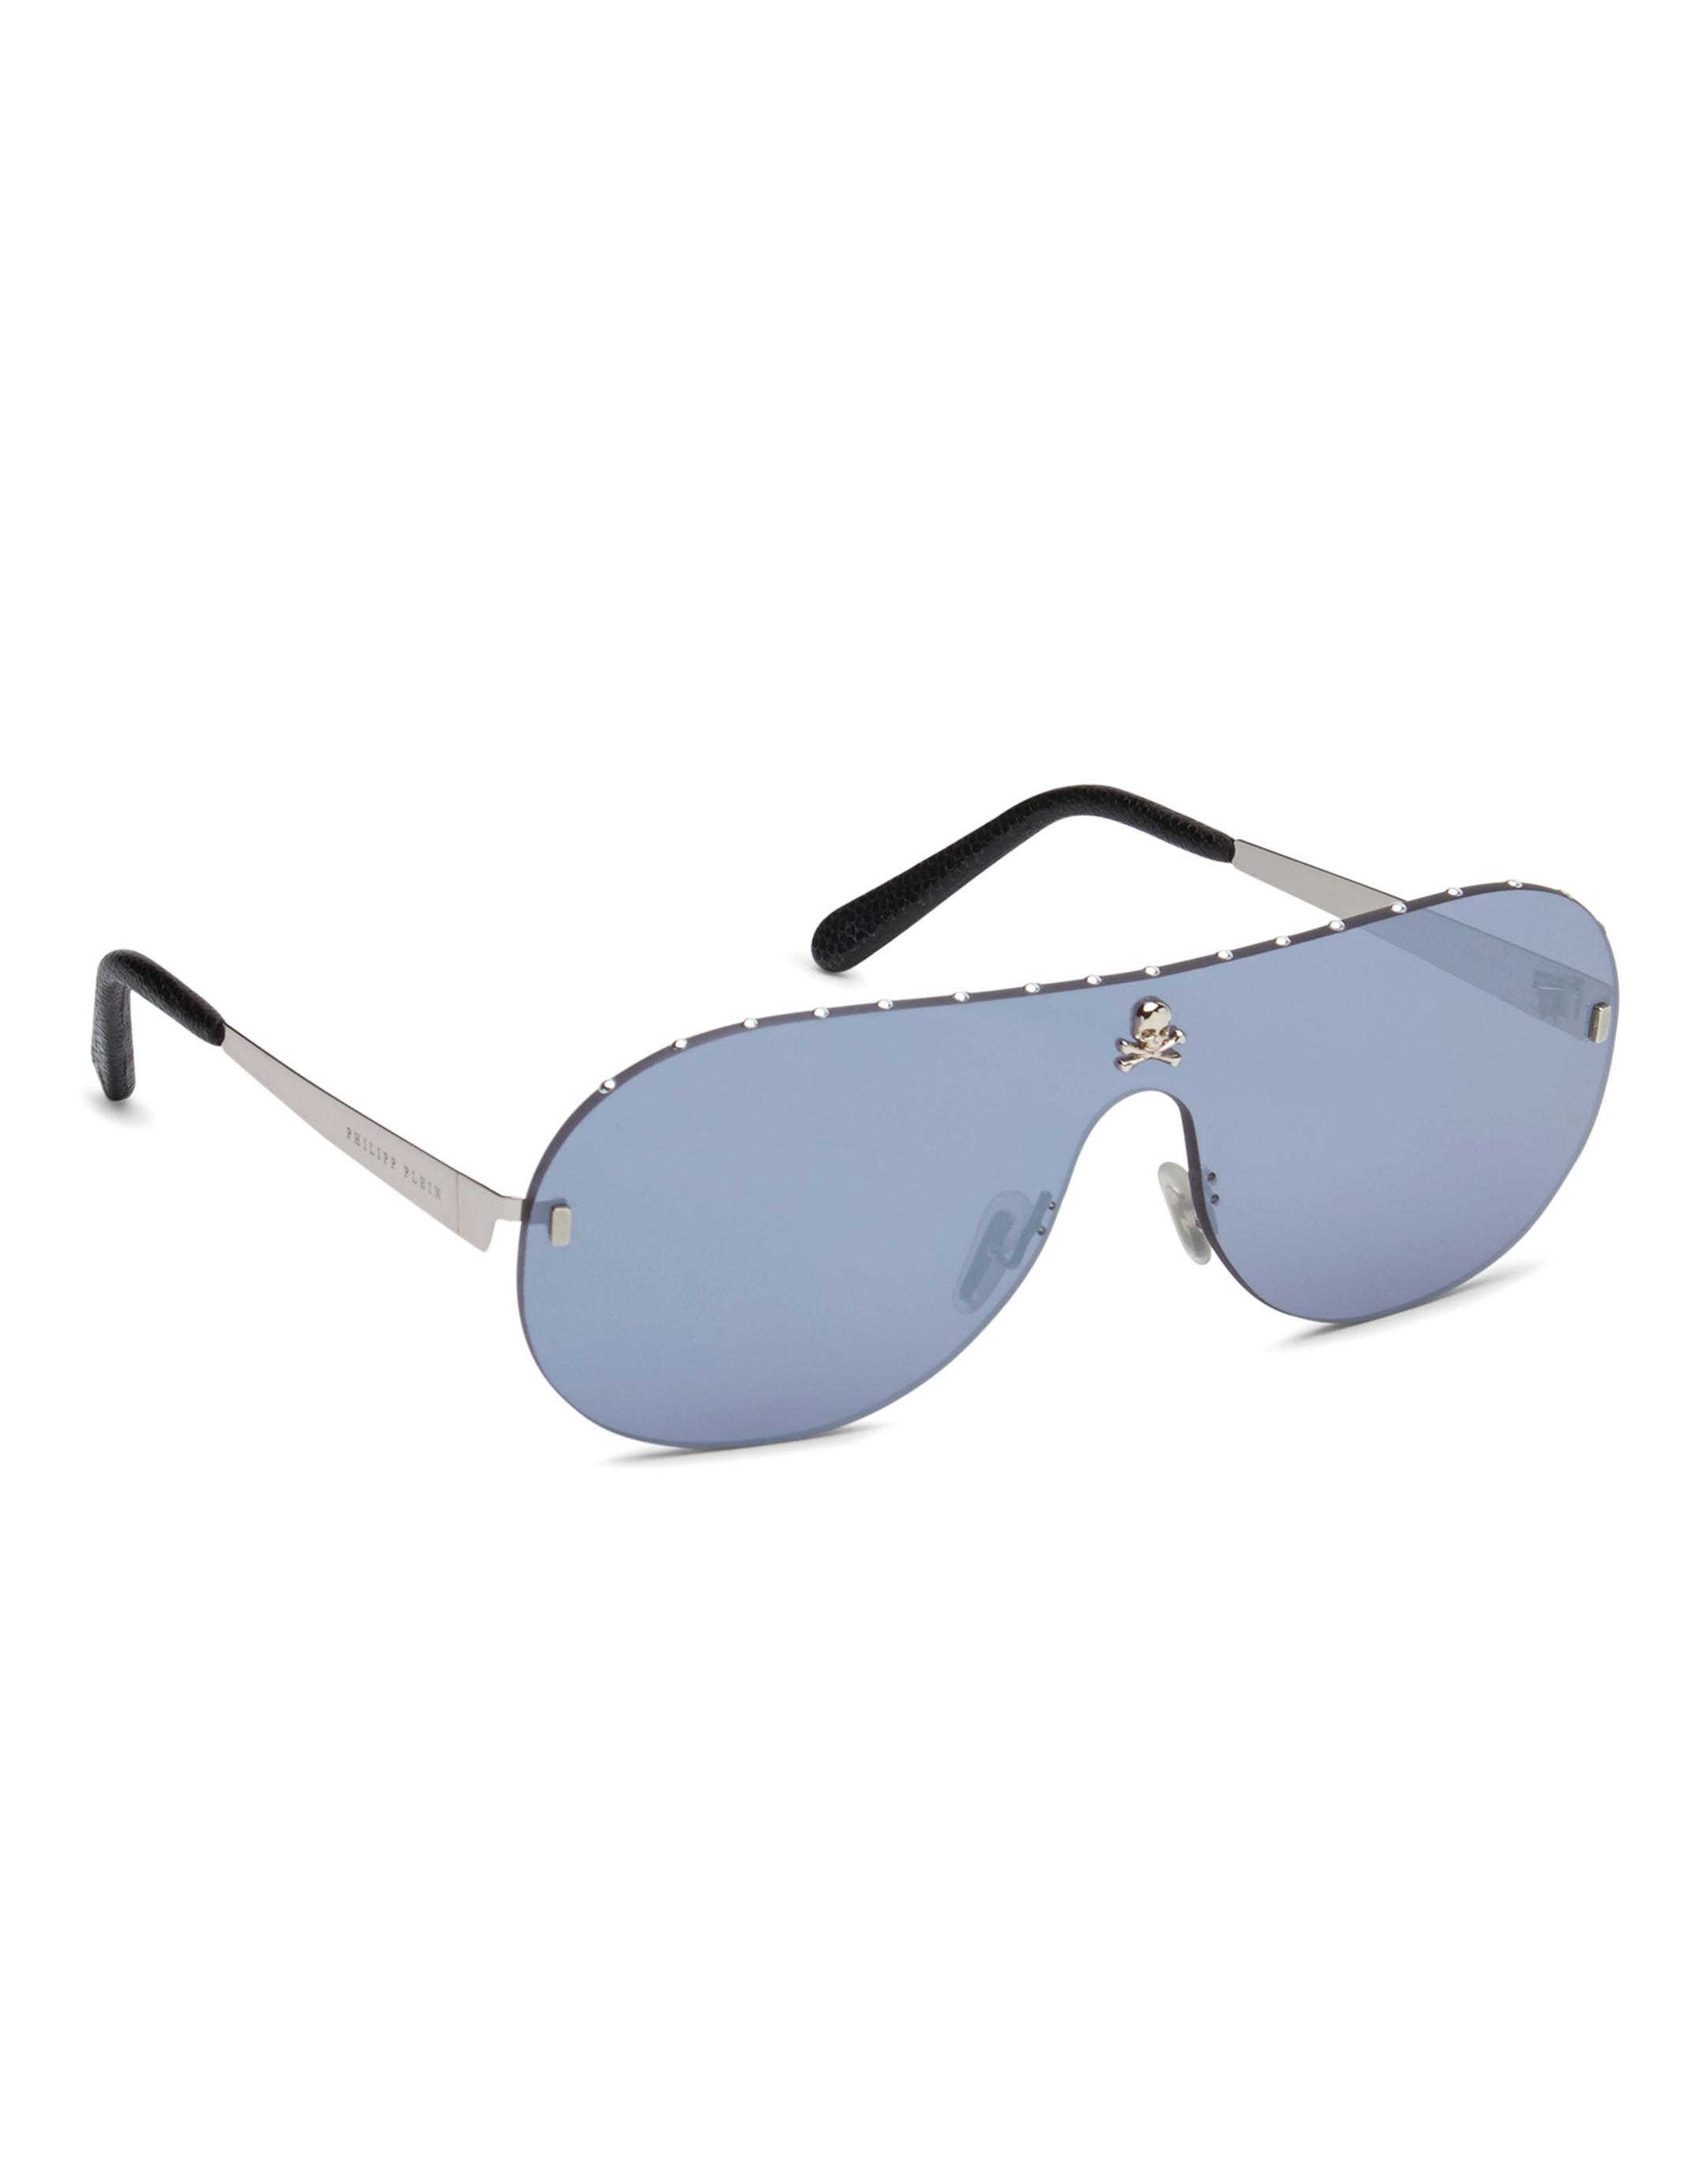 Philipp Plein Sunglasses Target Studs nuCjD4bvwJ